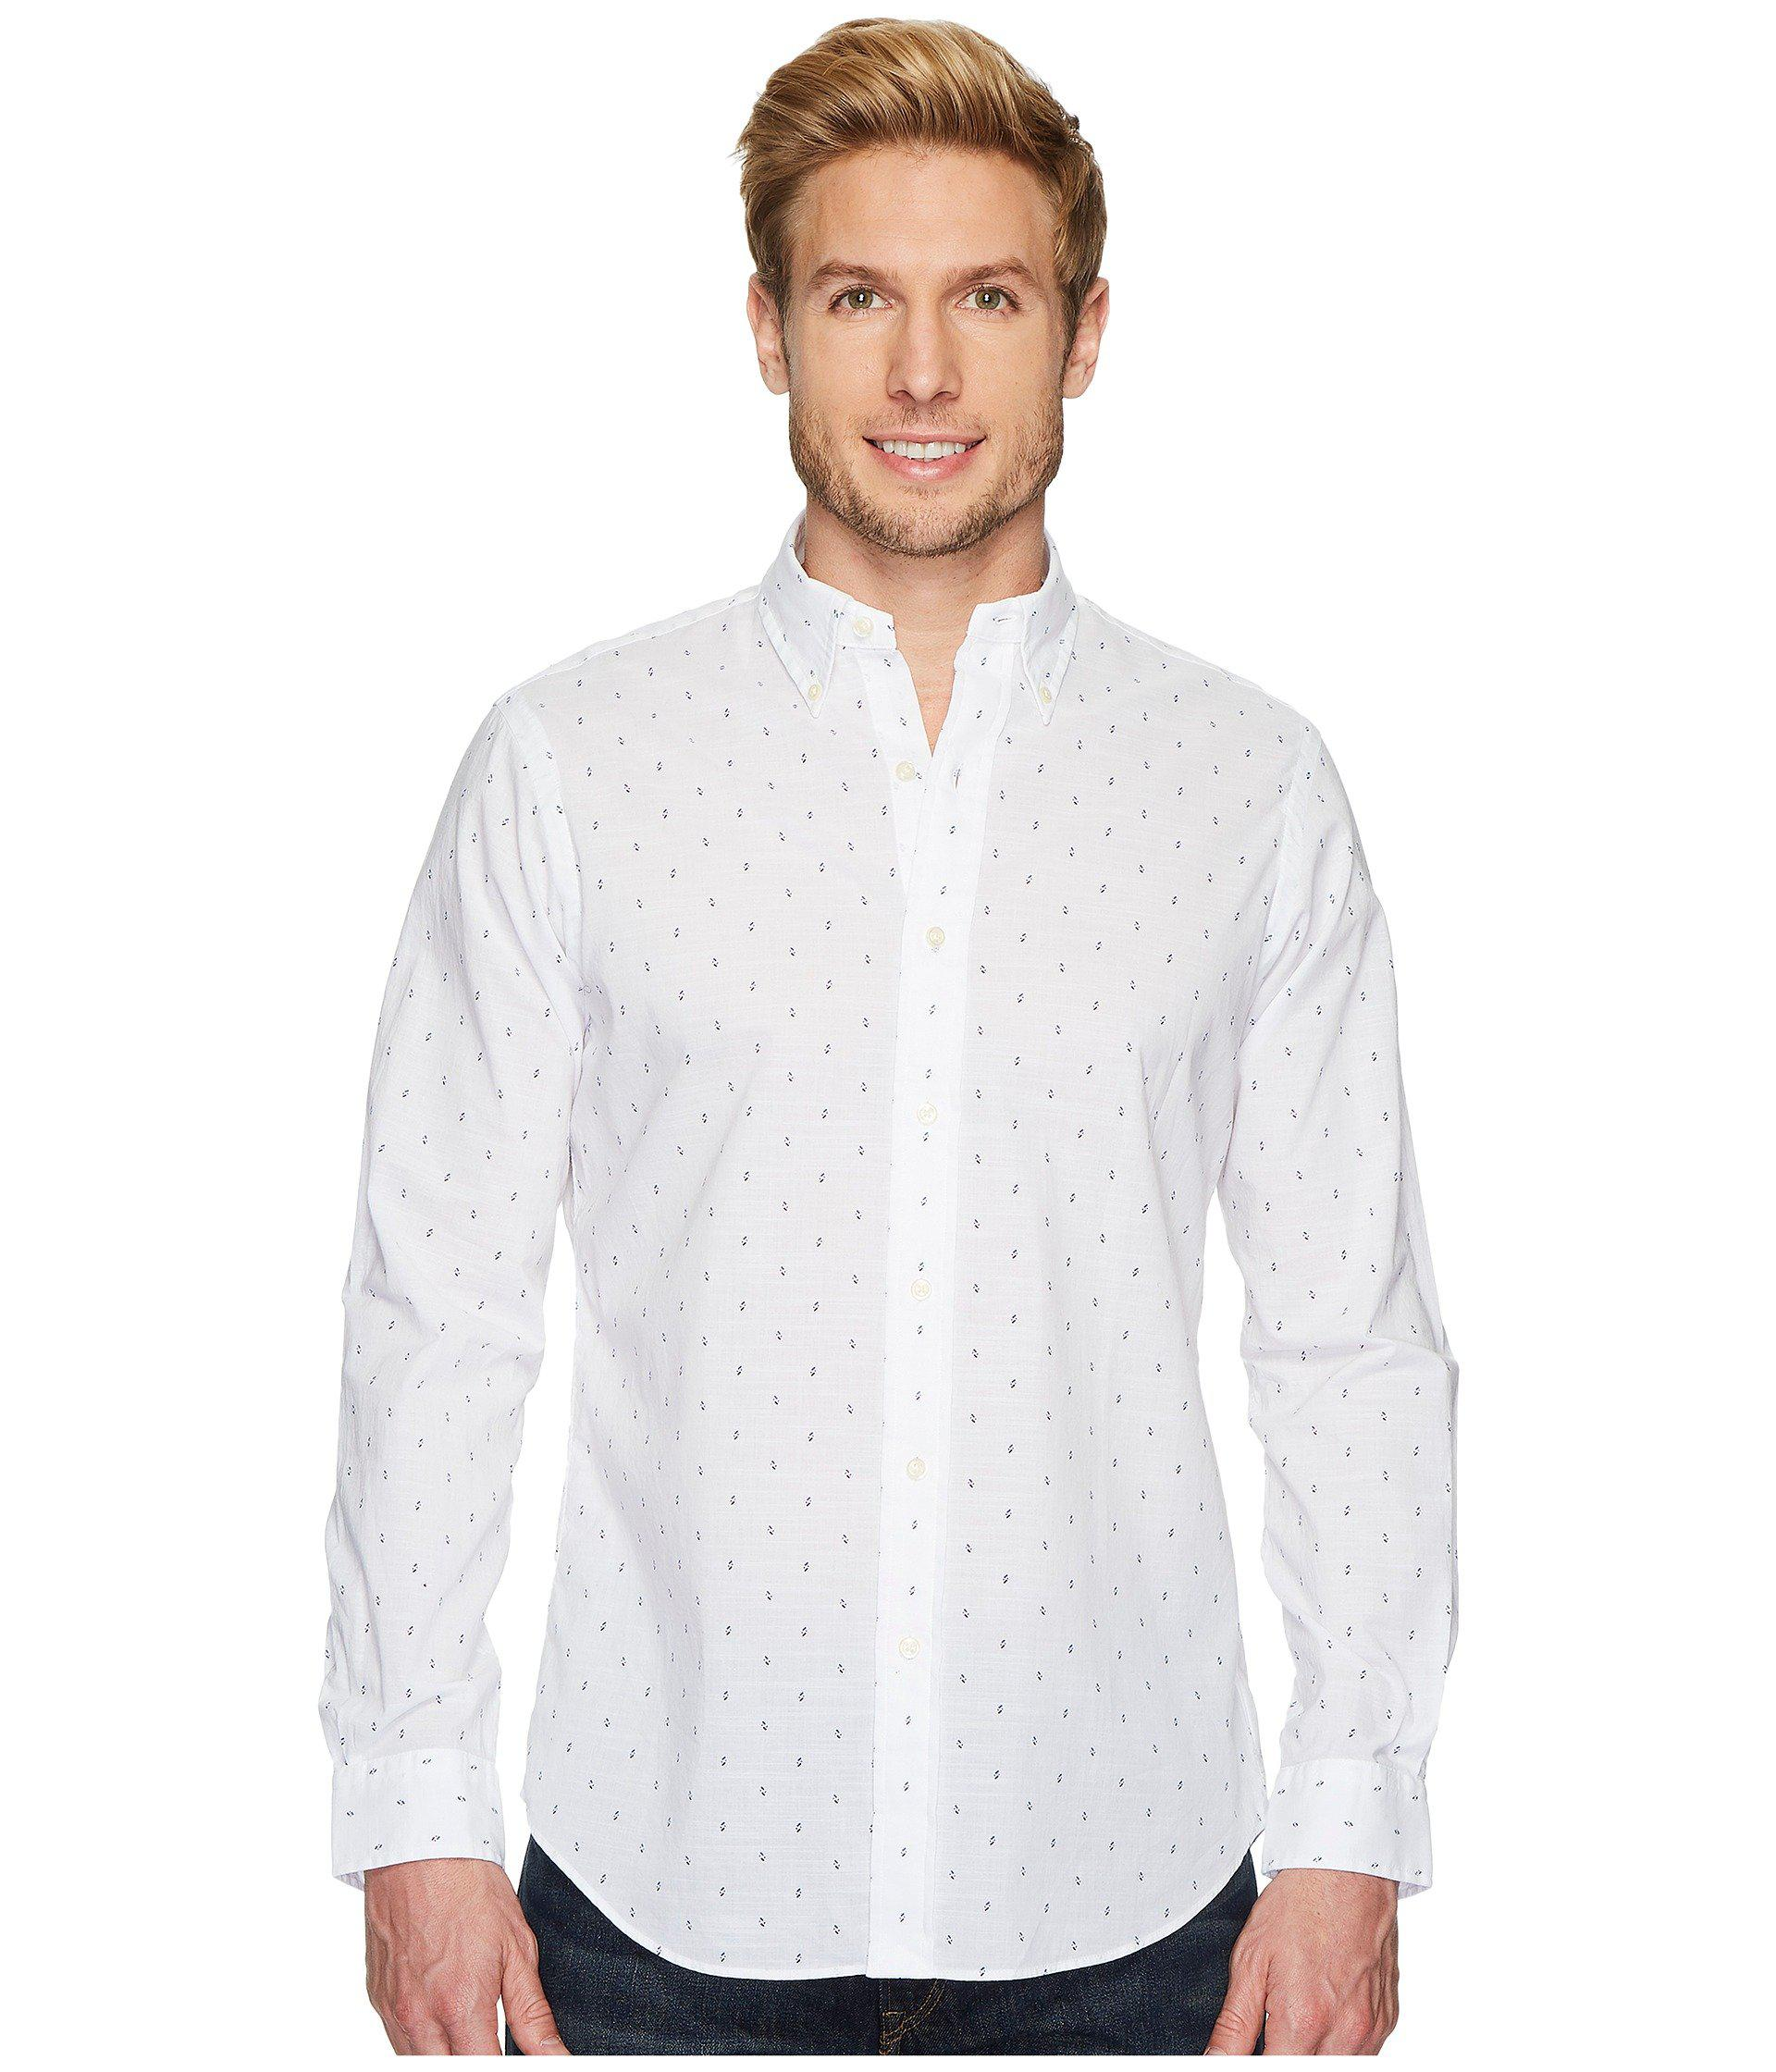 Lyst Polo Ralph Lauren Poplin Long Sleeve Sport Shirt White Arrow